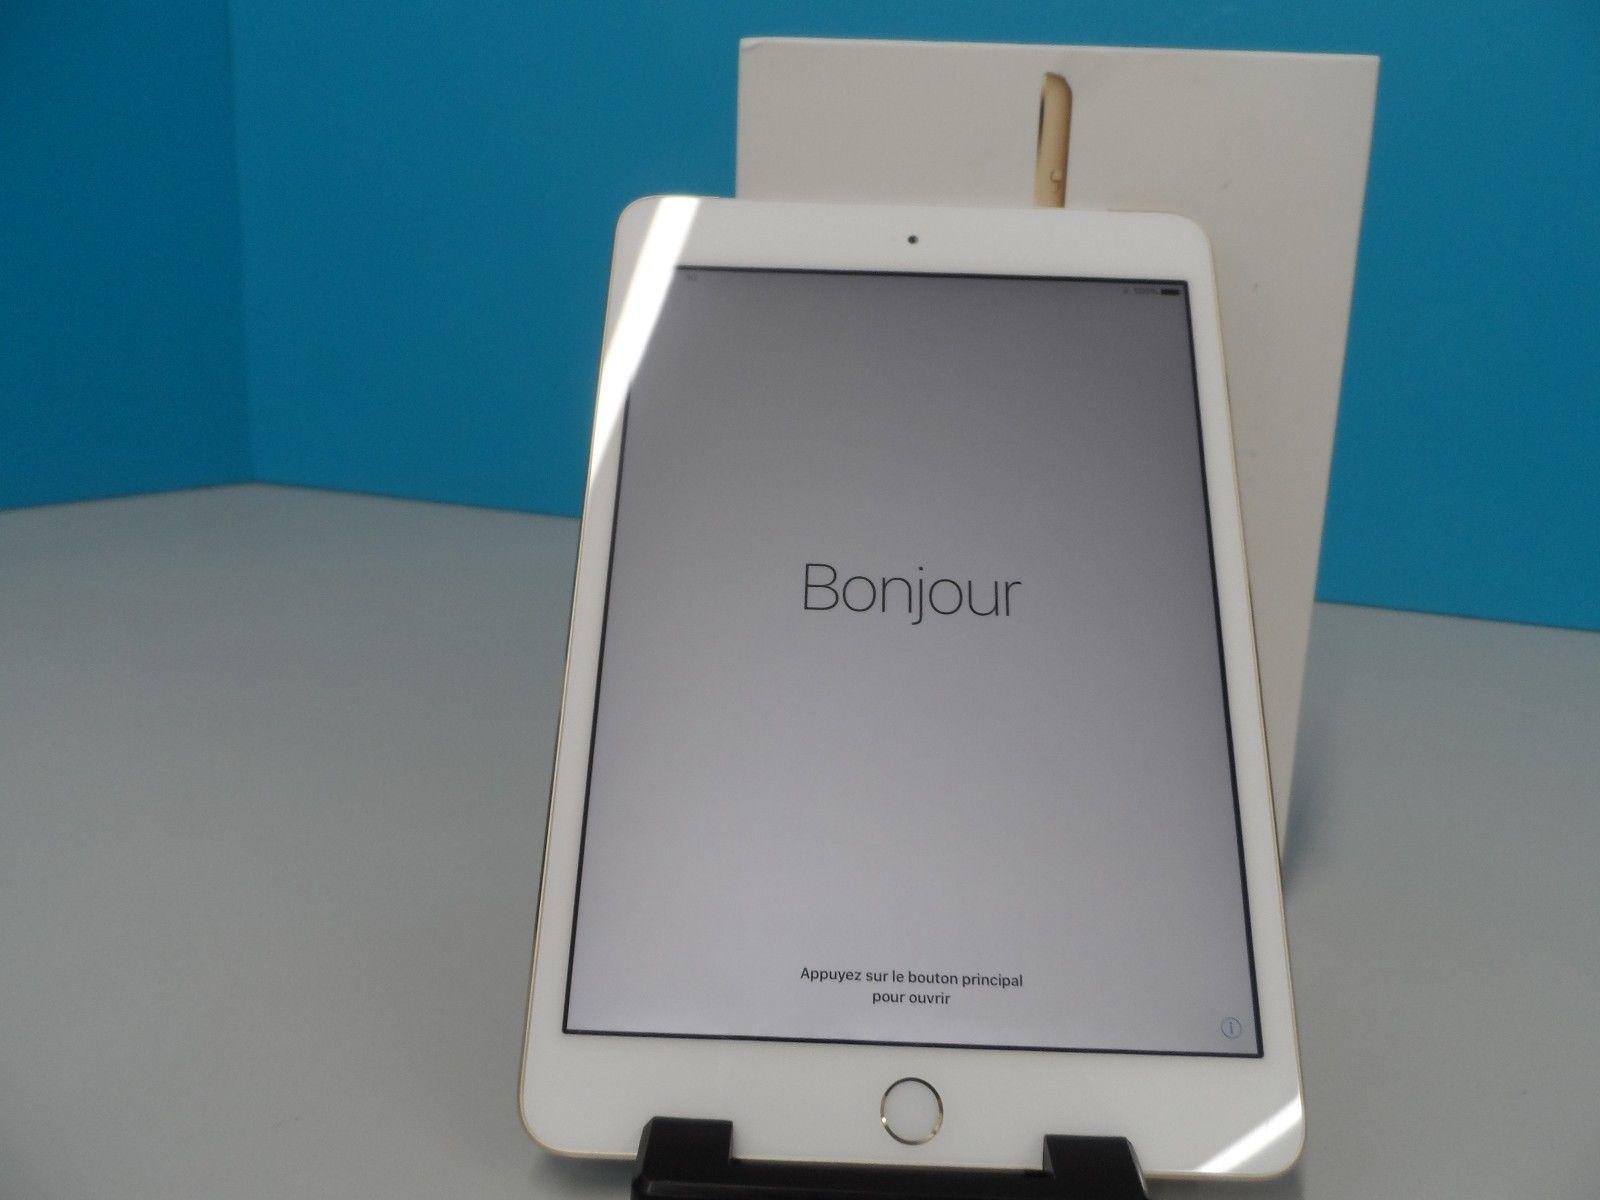 "Apple iPad Mini 3 A1600 Cellular A7 1GB 128GB Apple iOS 7.9"" Gold Tablet (99160) https://t.co/A4sN673tu0 https://t.co/GUpY27n0d7"